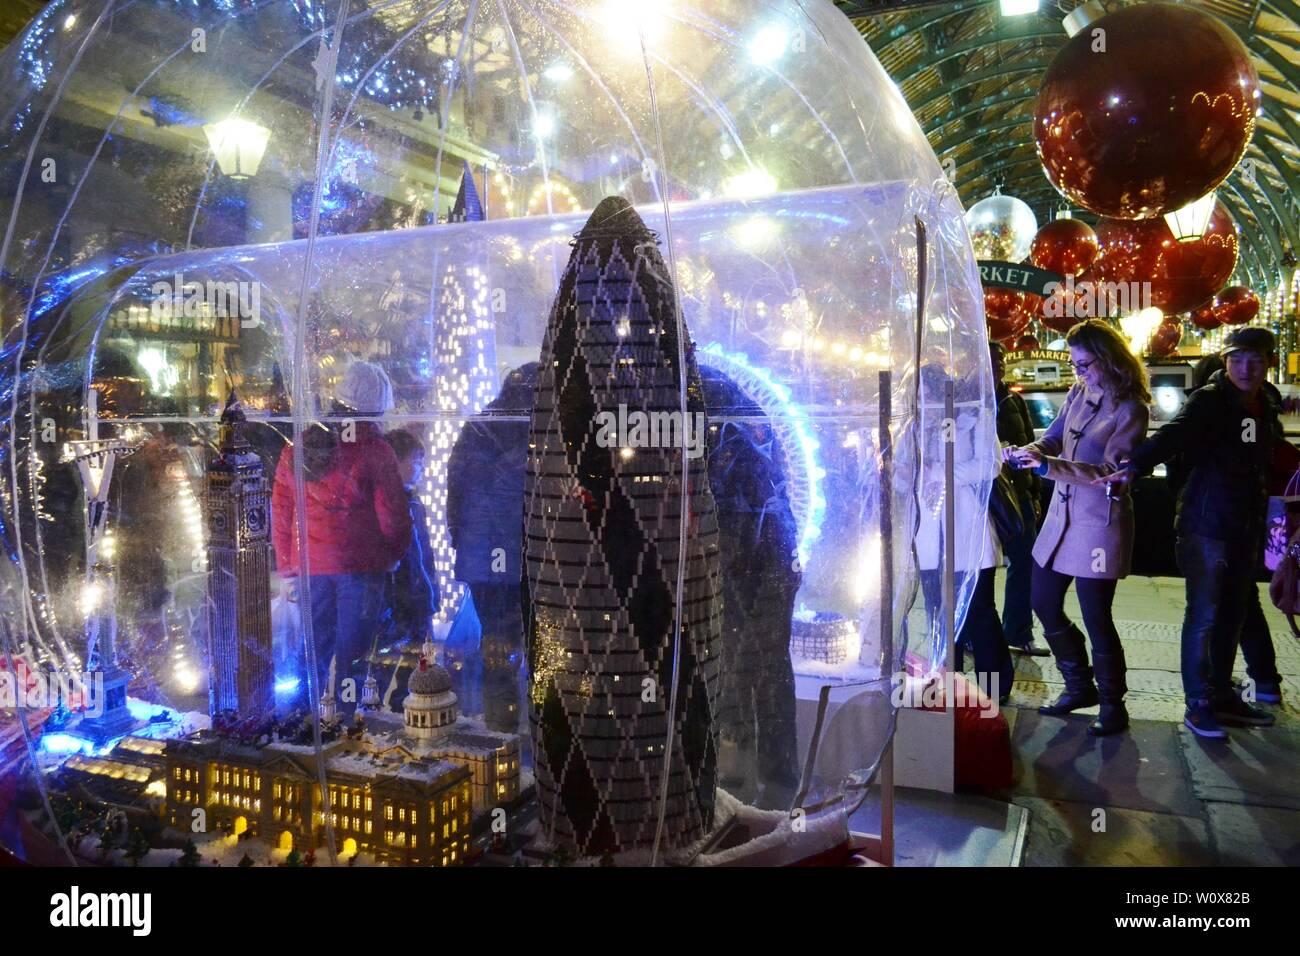 London/UK - November 27, 2013: People enjoying models of London famous landmarks exposed in the Covent Garden Apple market decorated for Christmas. Stock Photo